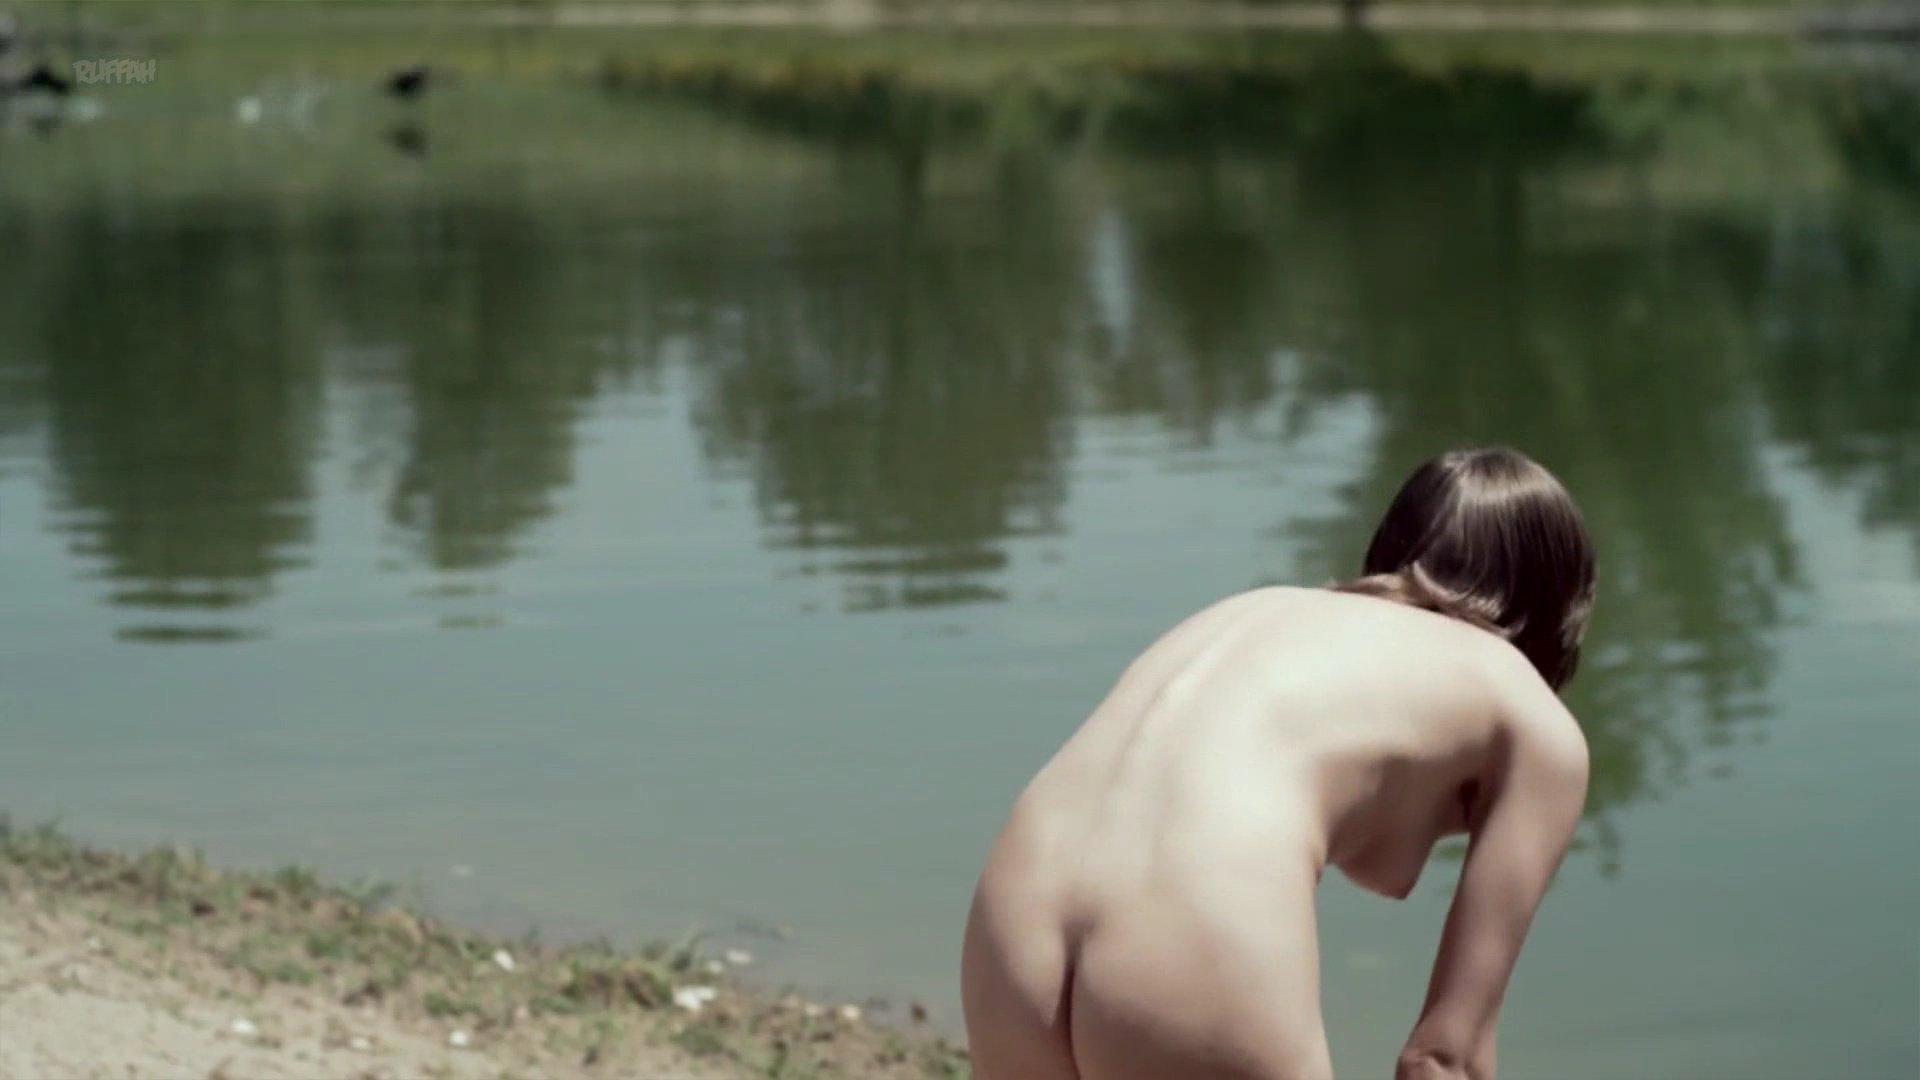 Morgan Carter nude - Slasher.com (2016)